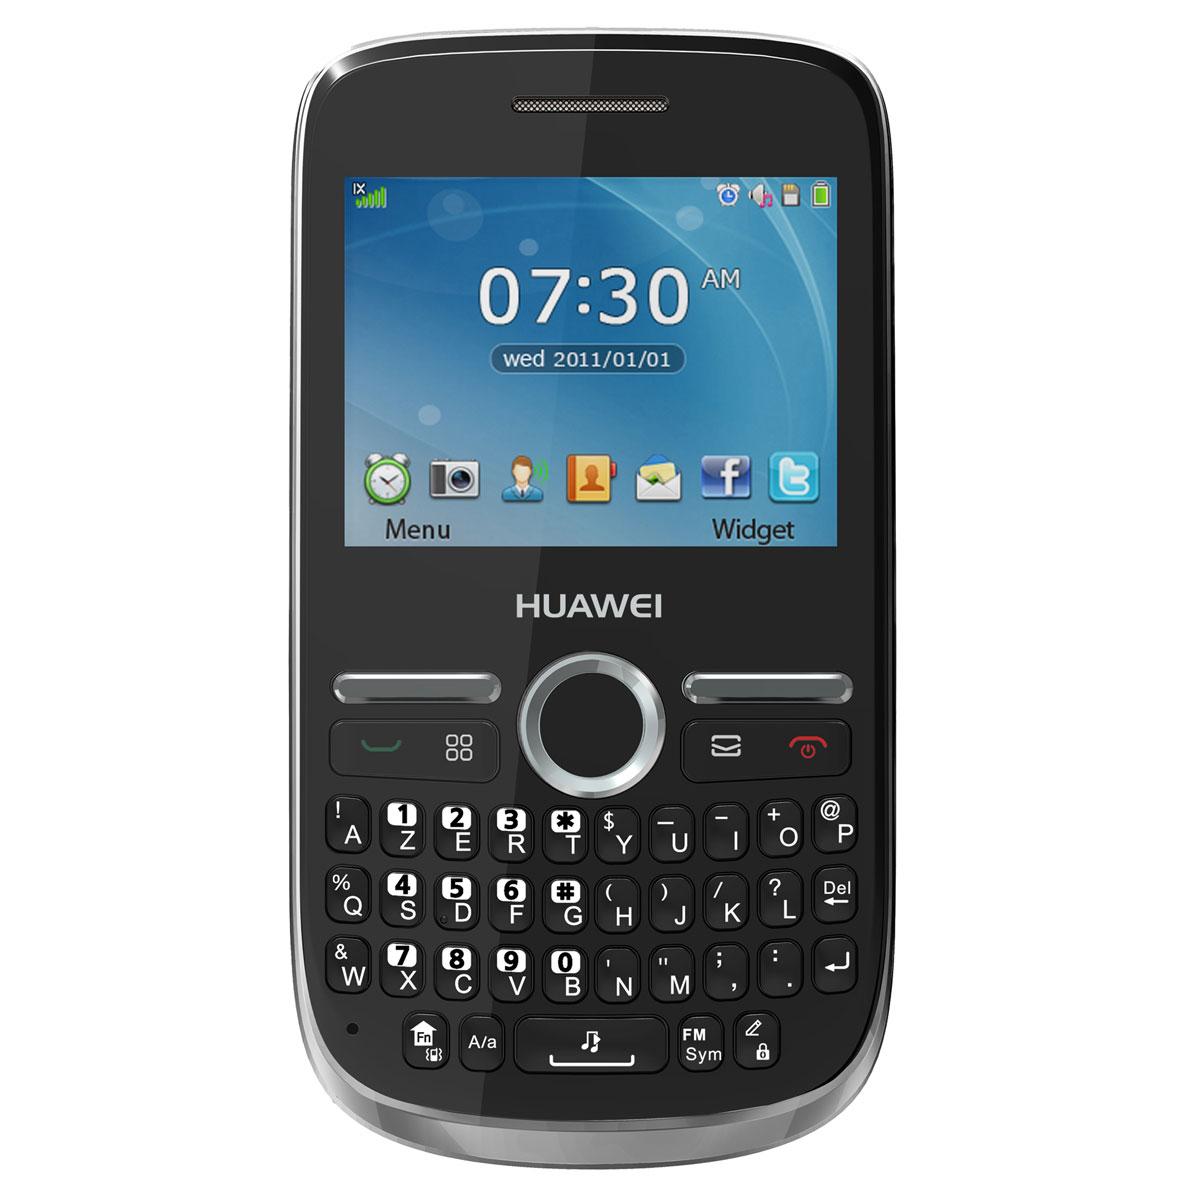 huawei g6608 mobile smartphone huawei sur. Black Bedroom Furniture Sets. Home Design Ideas